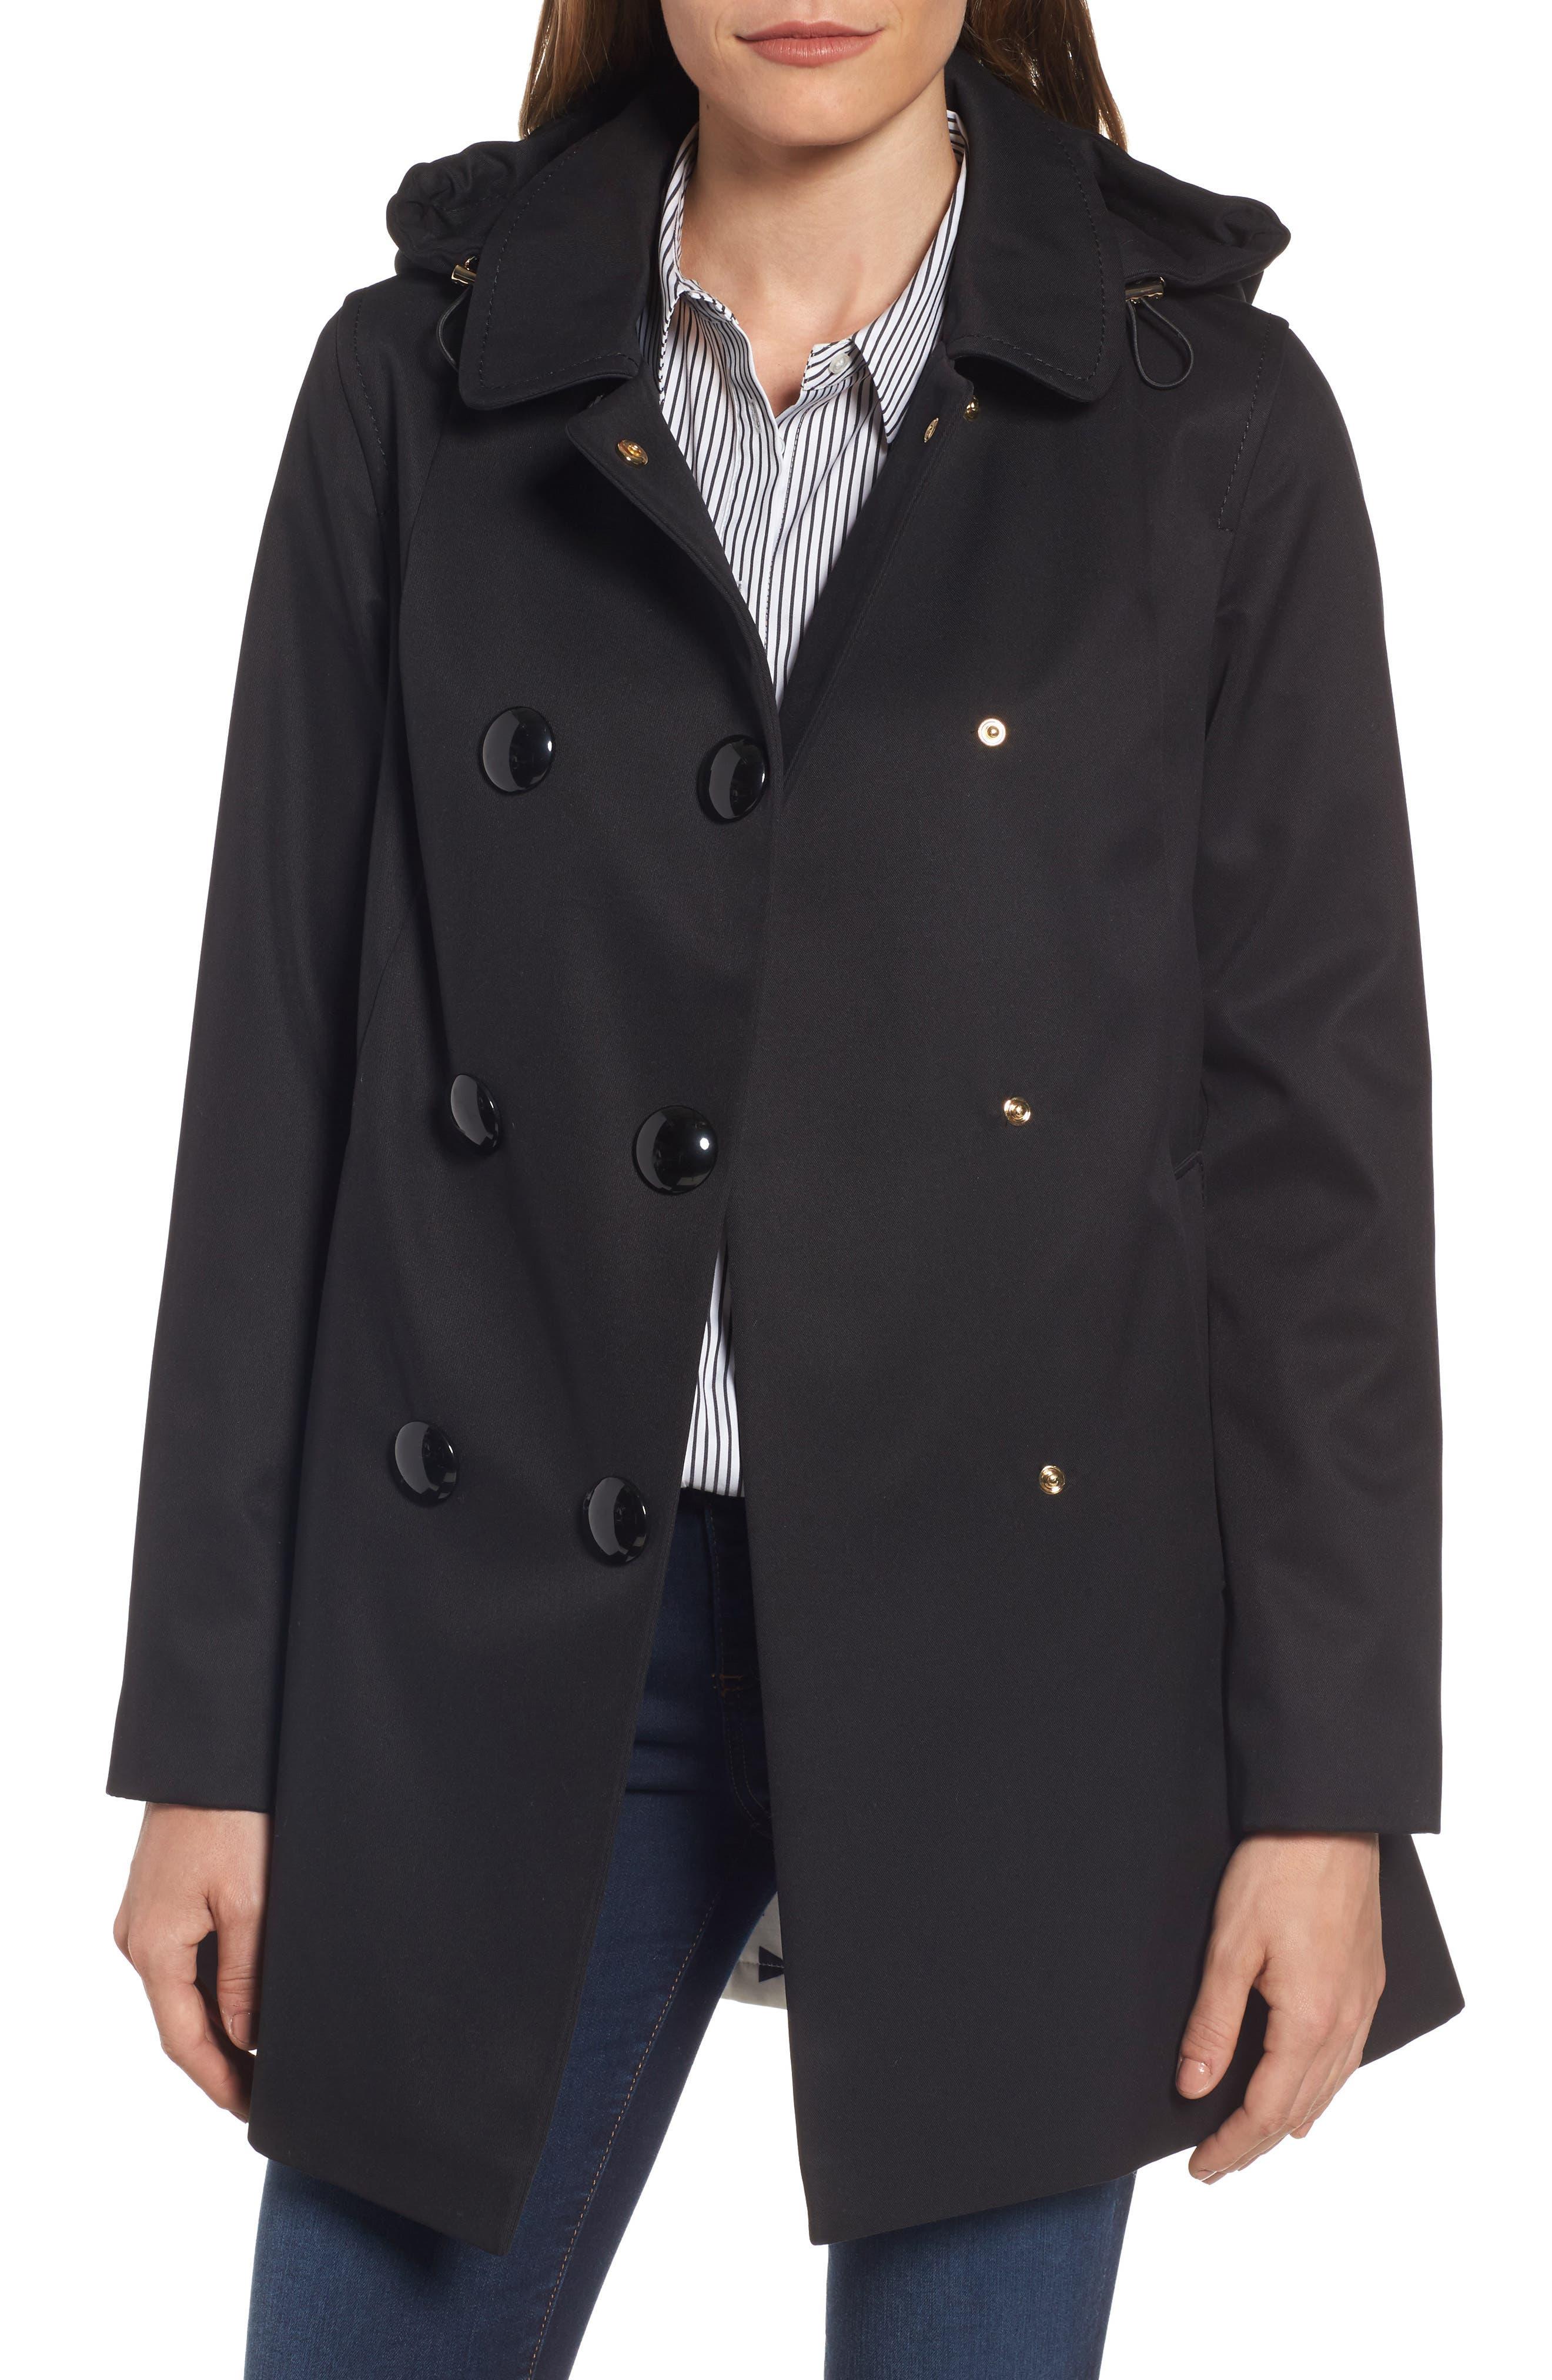 Main Image - kate spade new york scallop pocket a-line raincoat (regular & petite)